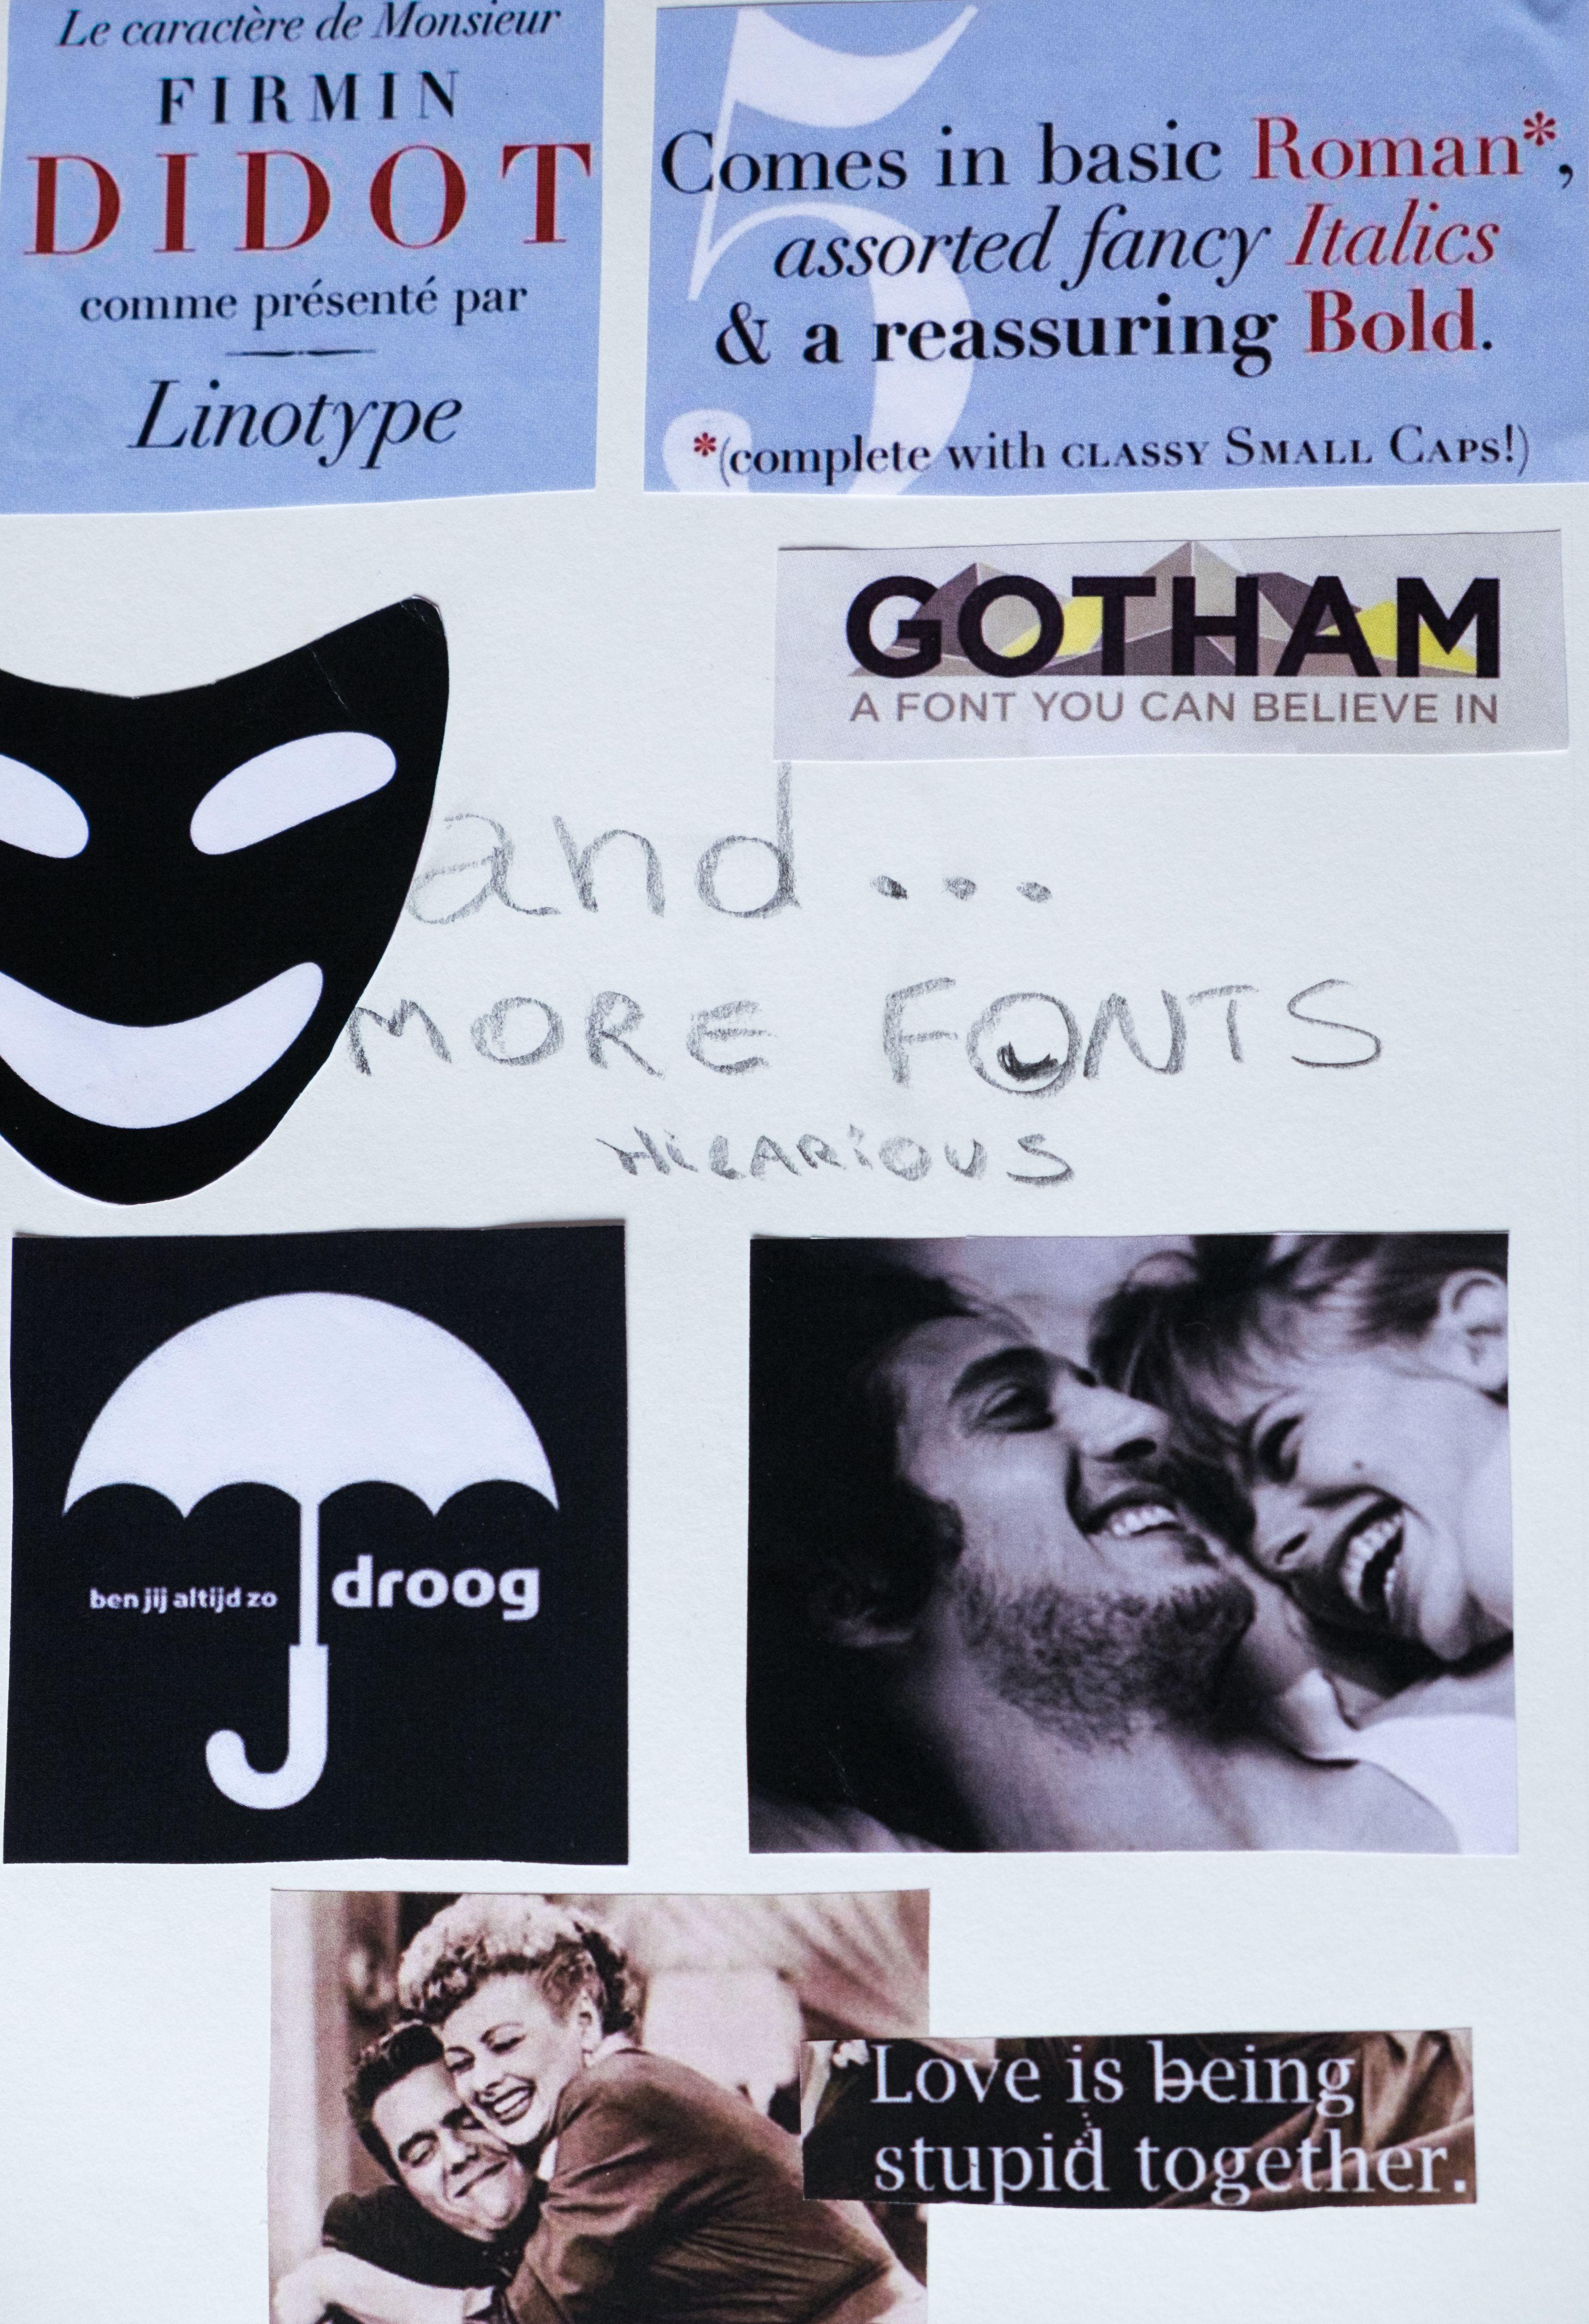 Pagina 5 fonts -Didot font : vb comedies: 'Hitch', 'Something Borrowed', 'Think Like a Man' - Gotham font (geometric sans serif digital font by American Tobias Frere-Jones (2000)) Vb. comedies: 'Bridesmaids', 'That Awkward Moment'